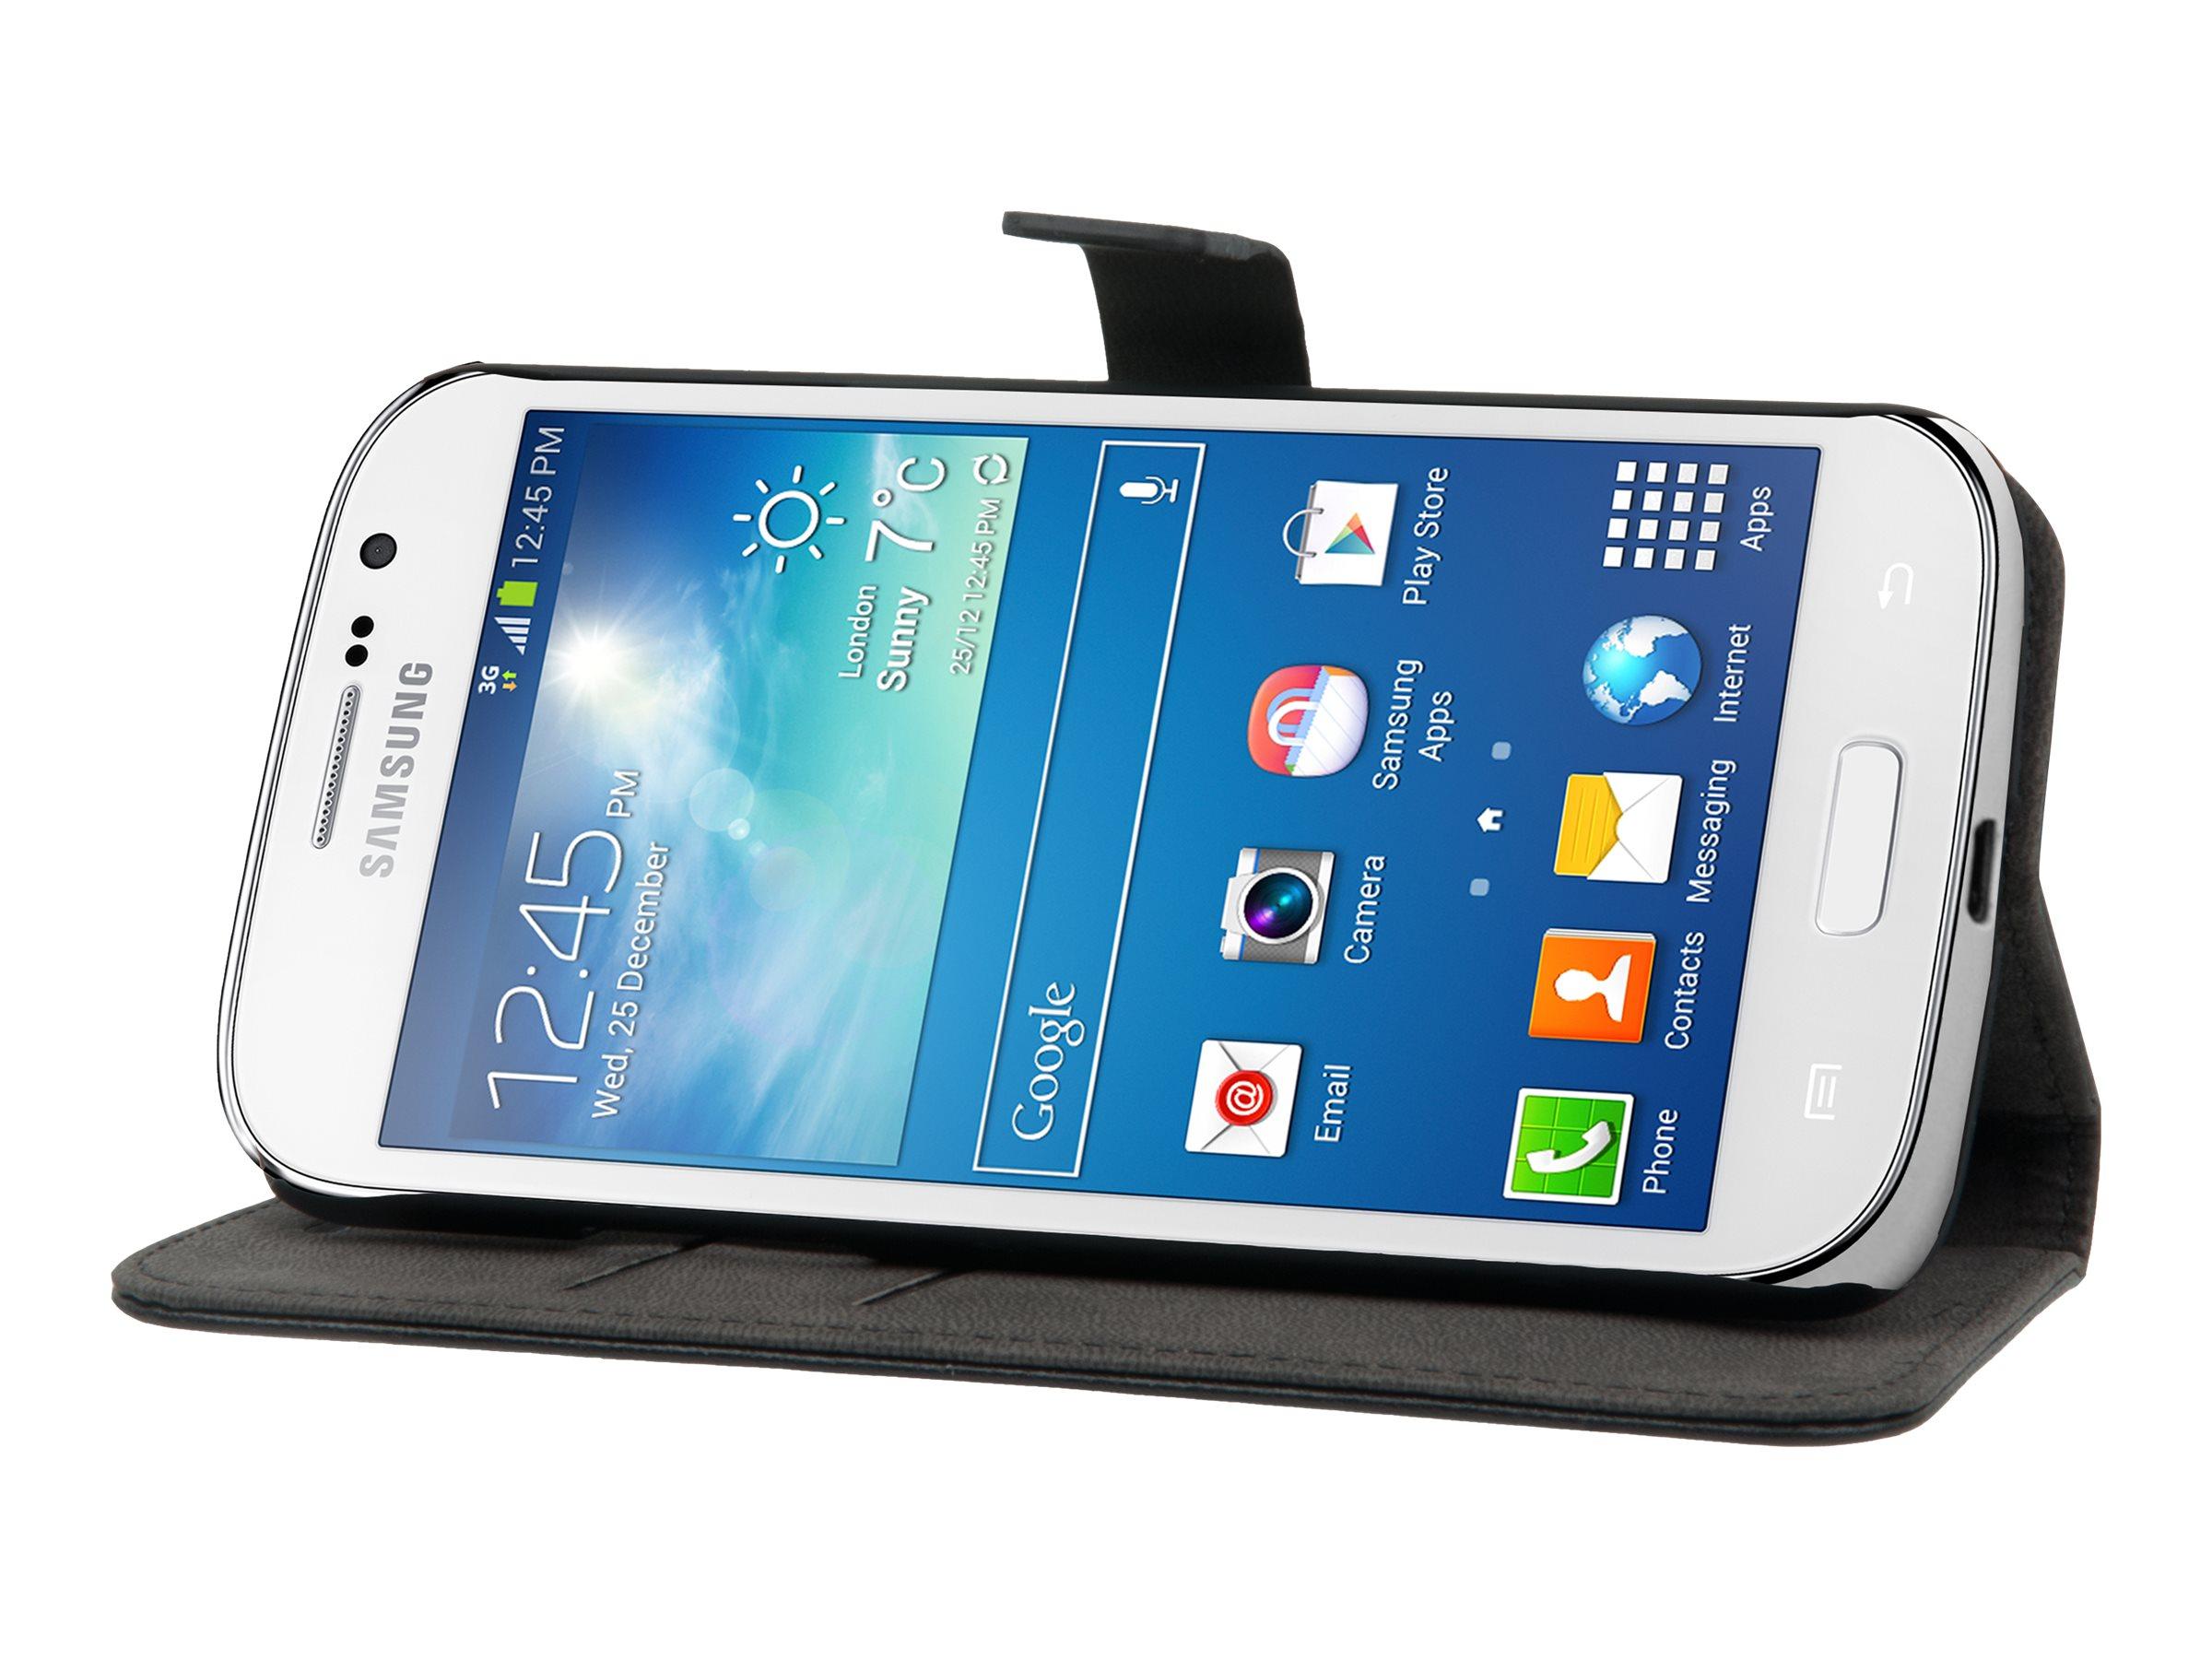 Muvit Slim Folio - Protection à rabat pour Samsung GALAXY Grand Lite, Grand Neo - noir